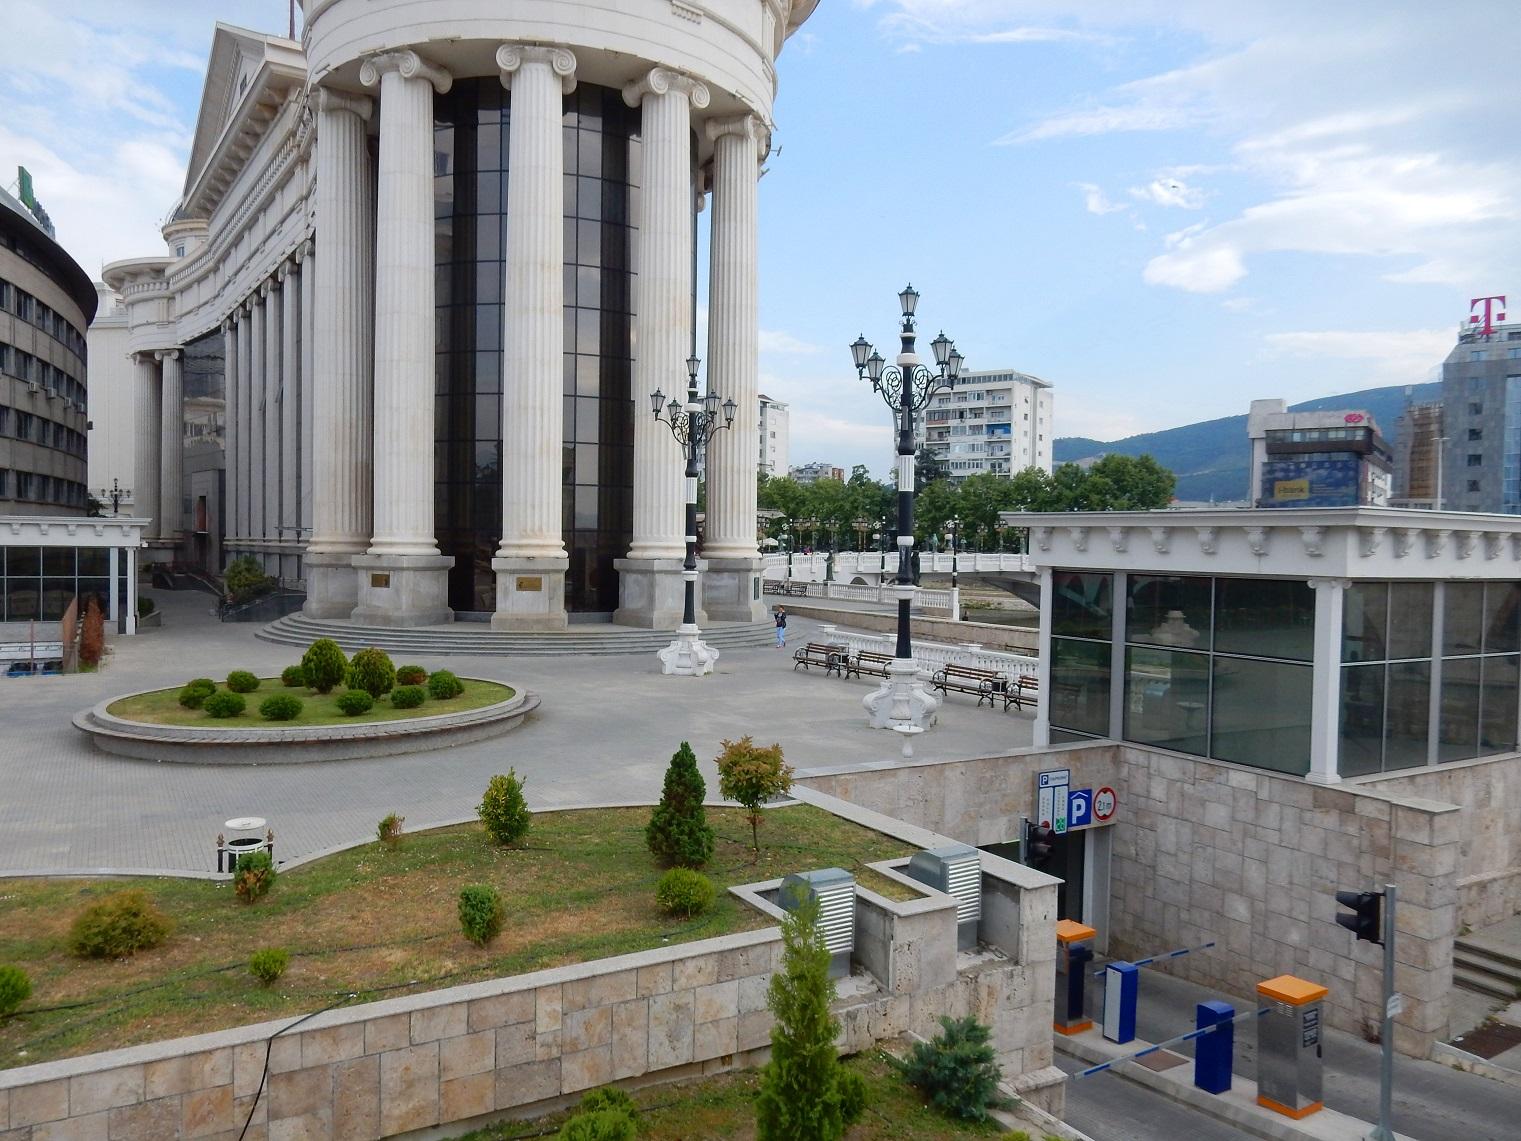 Skopje architecture, parking